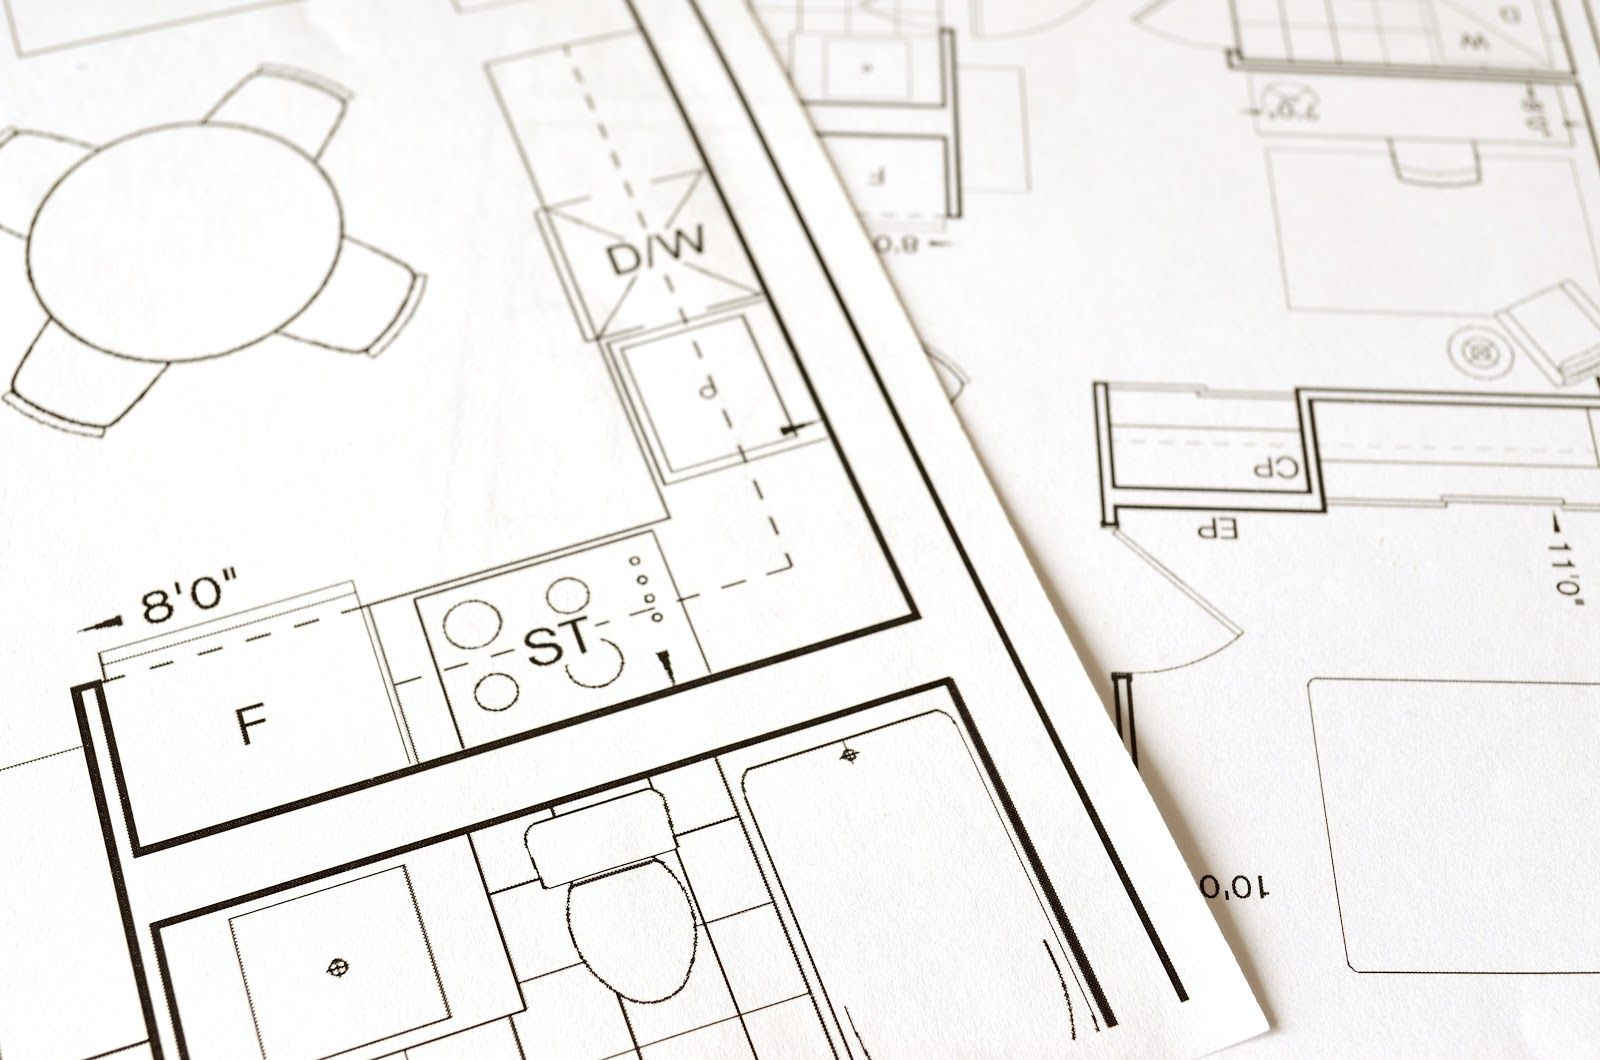 Image shows a custom home floor plan design.